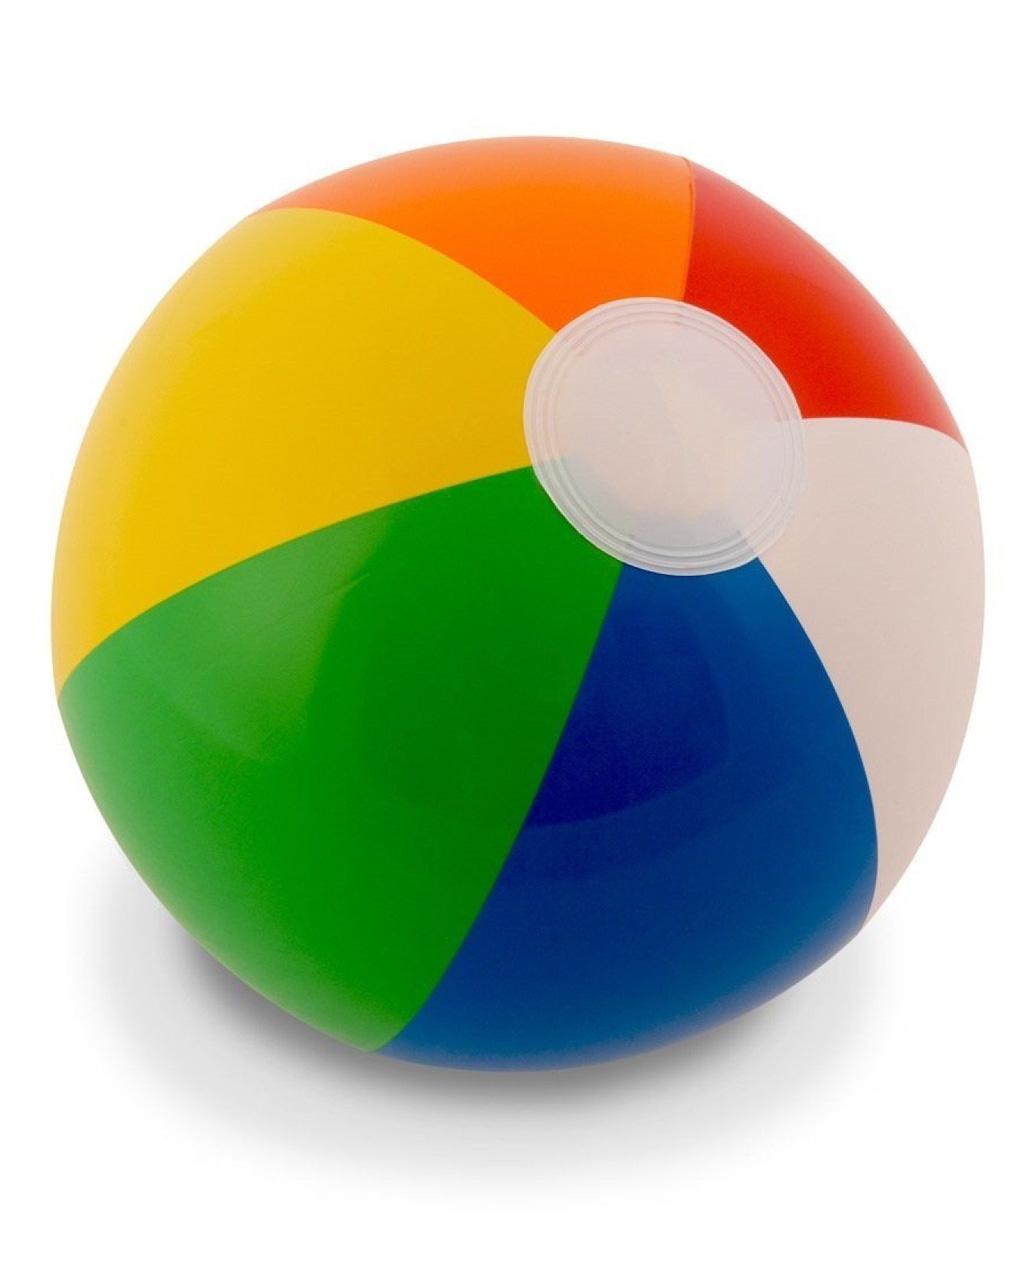 beach ball image - 907×907